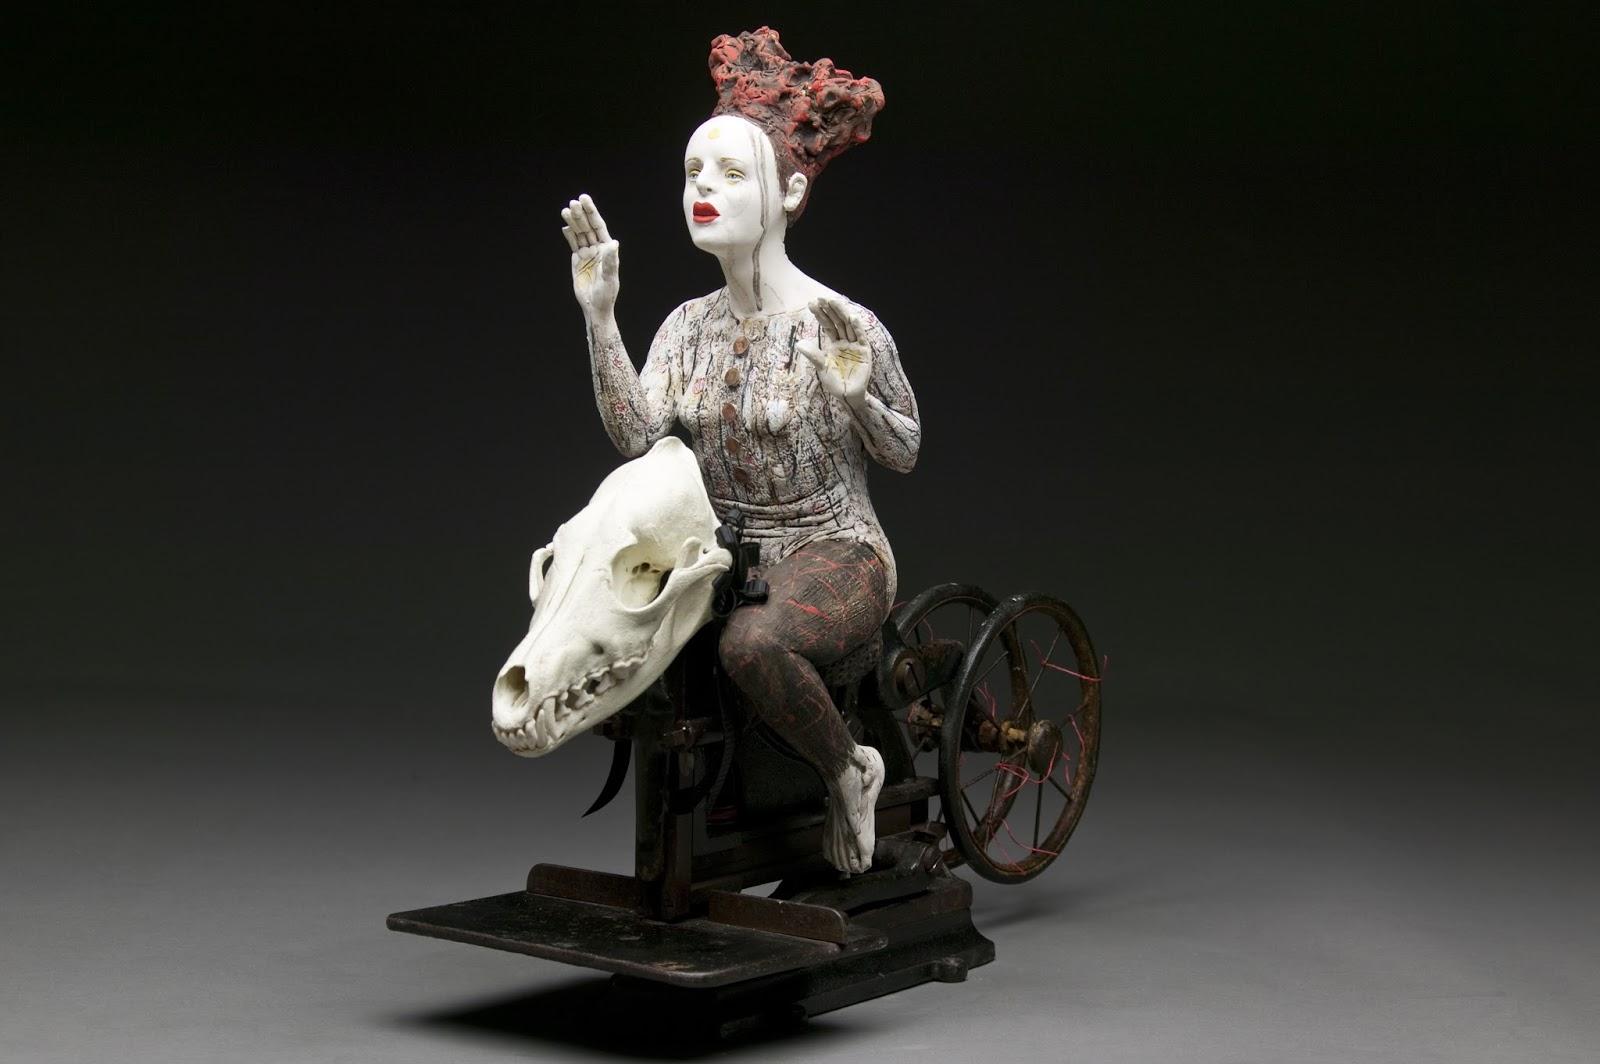 Kirsten Stingle- sculptures mixed art